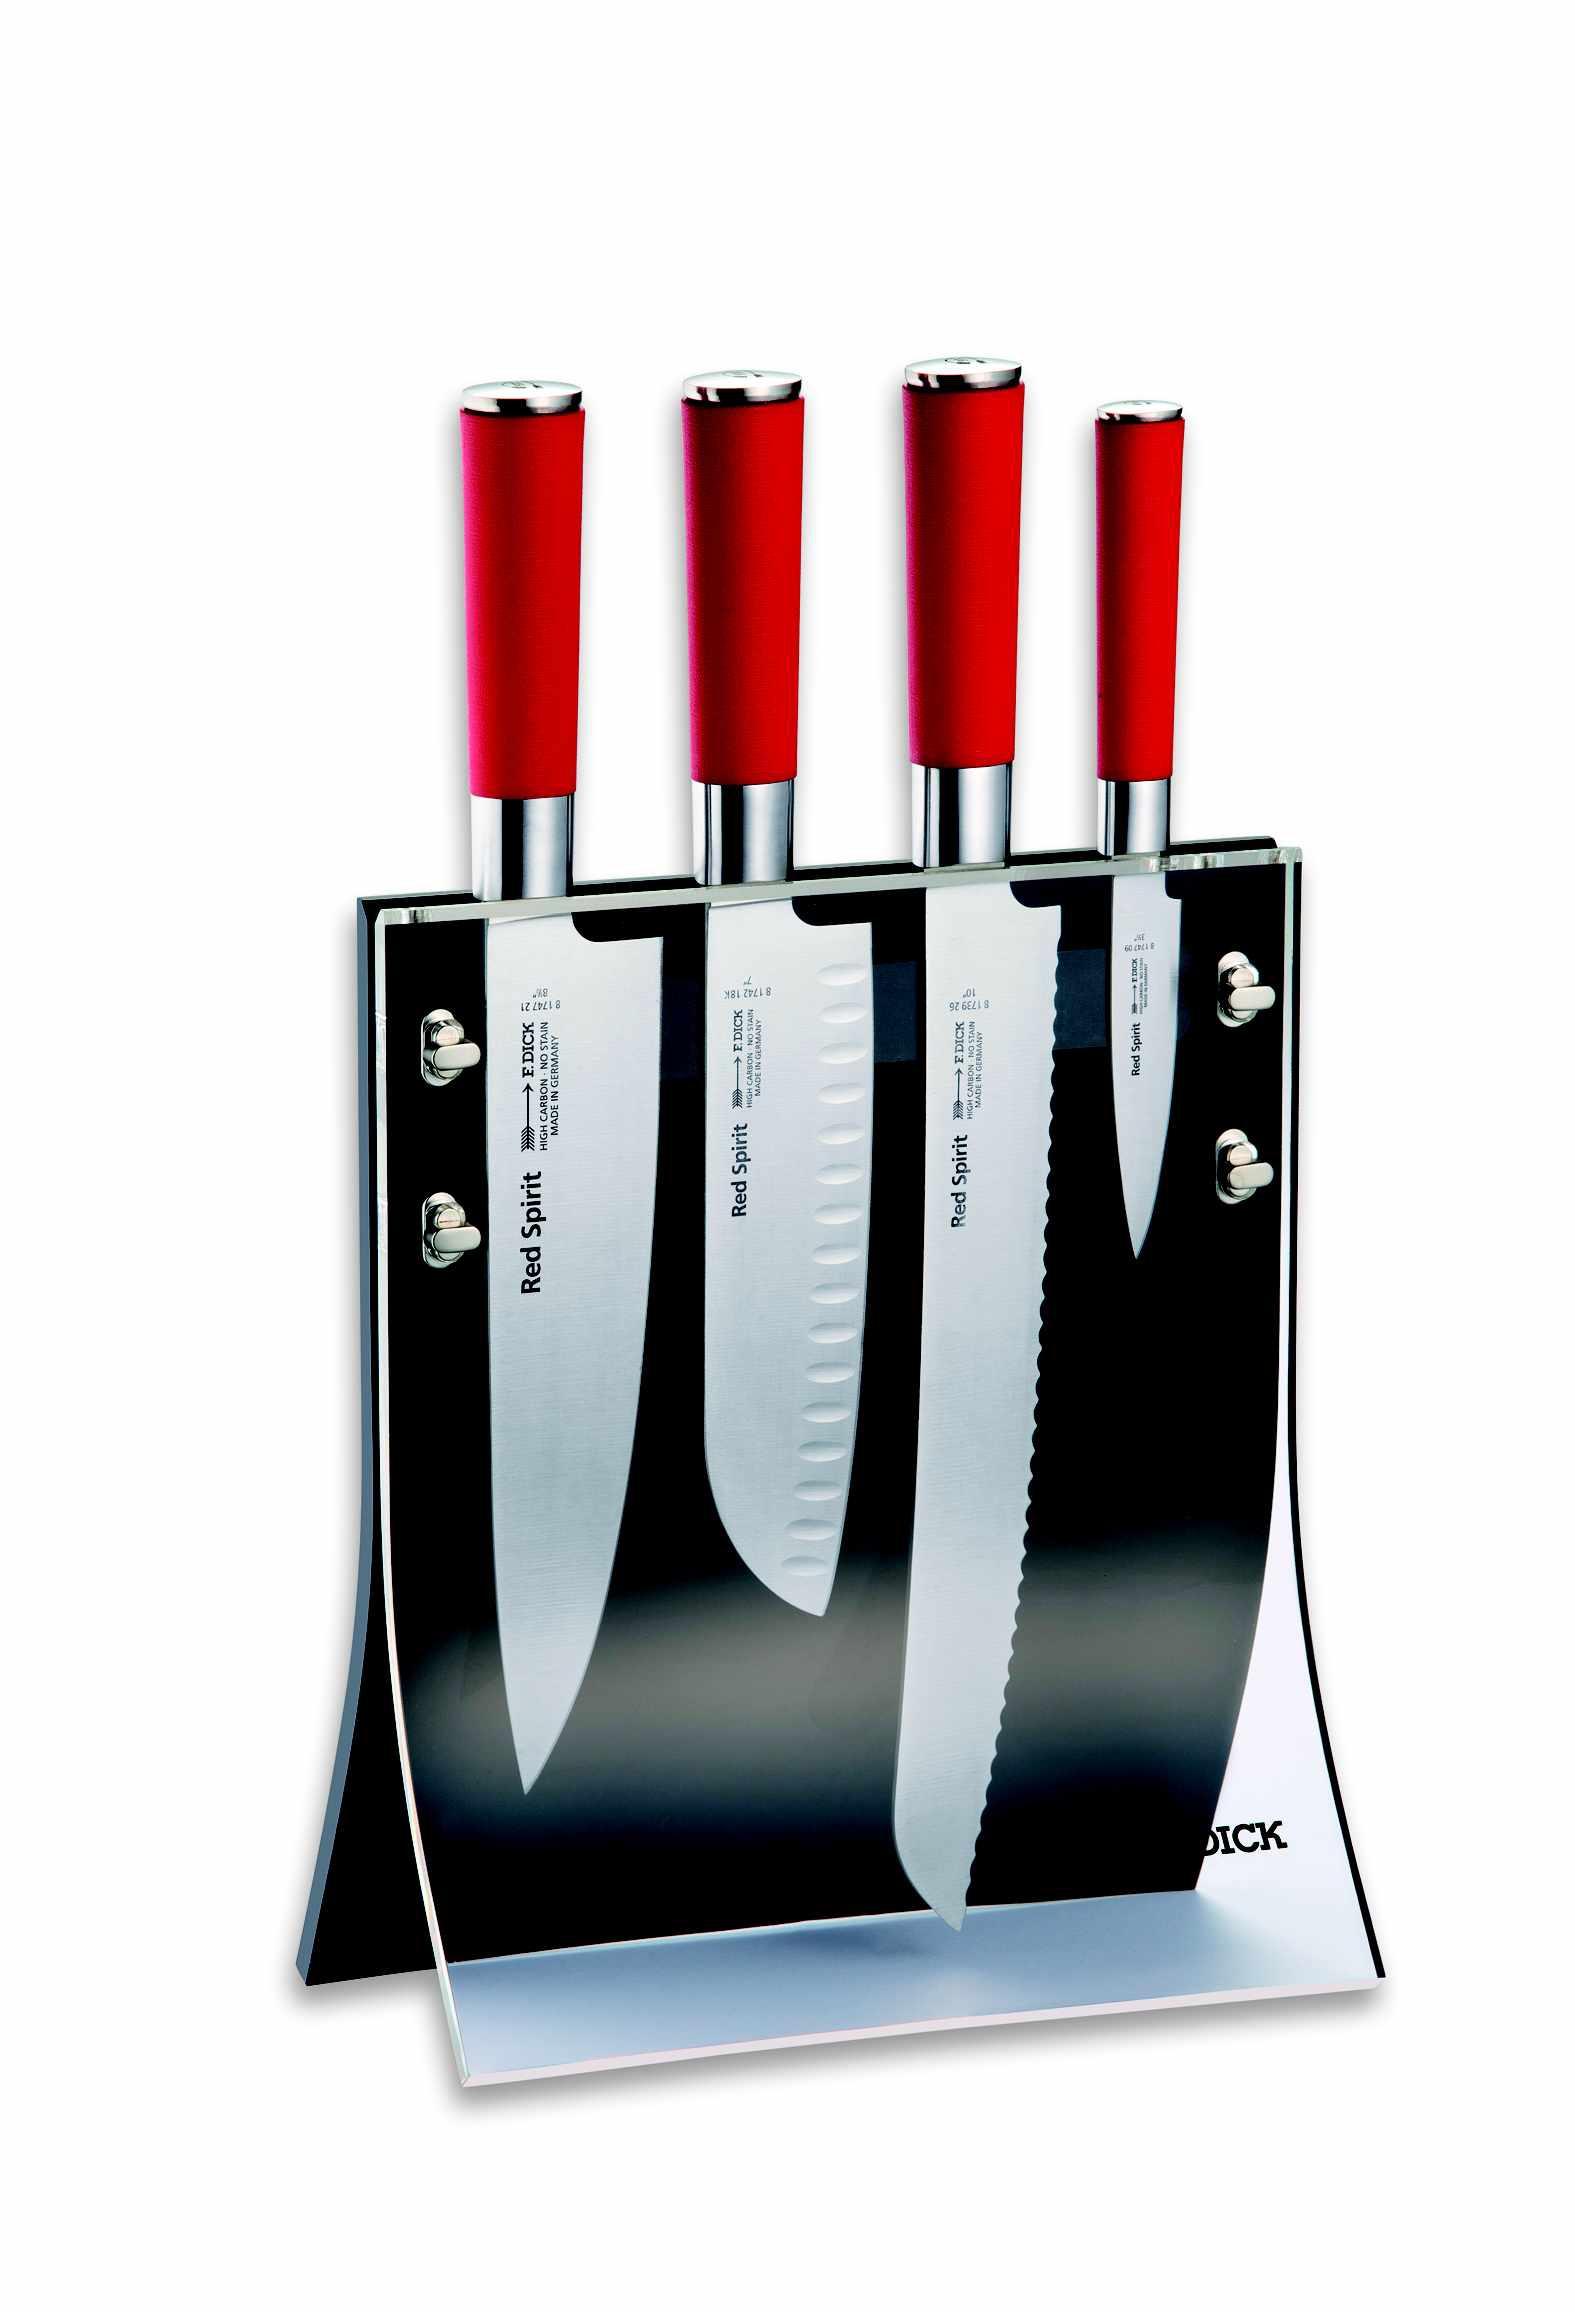 F.Dick, Sada kuchařských kovaných nožů 4ks s magnetickým stojanem, Red Spirit